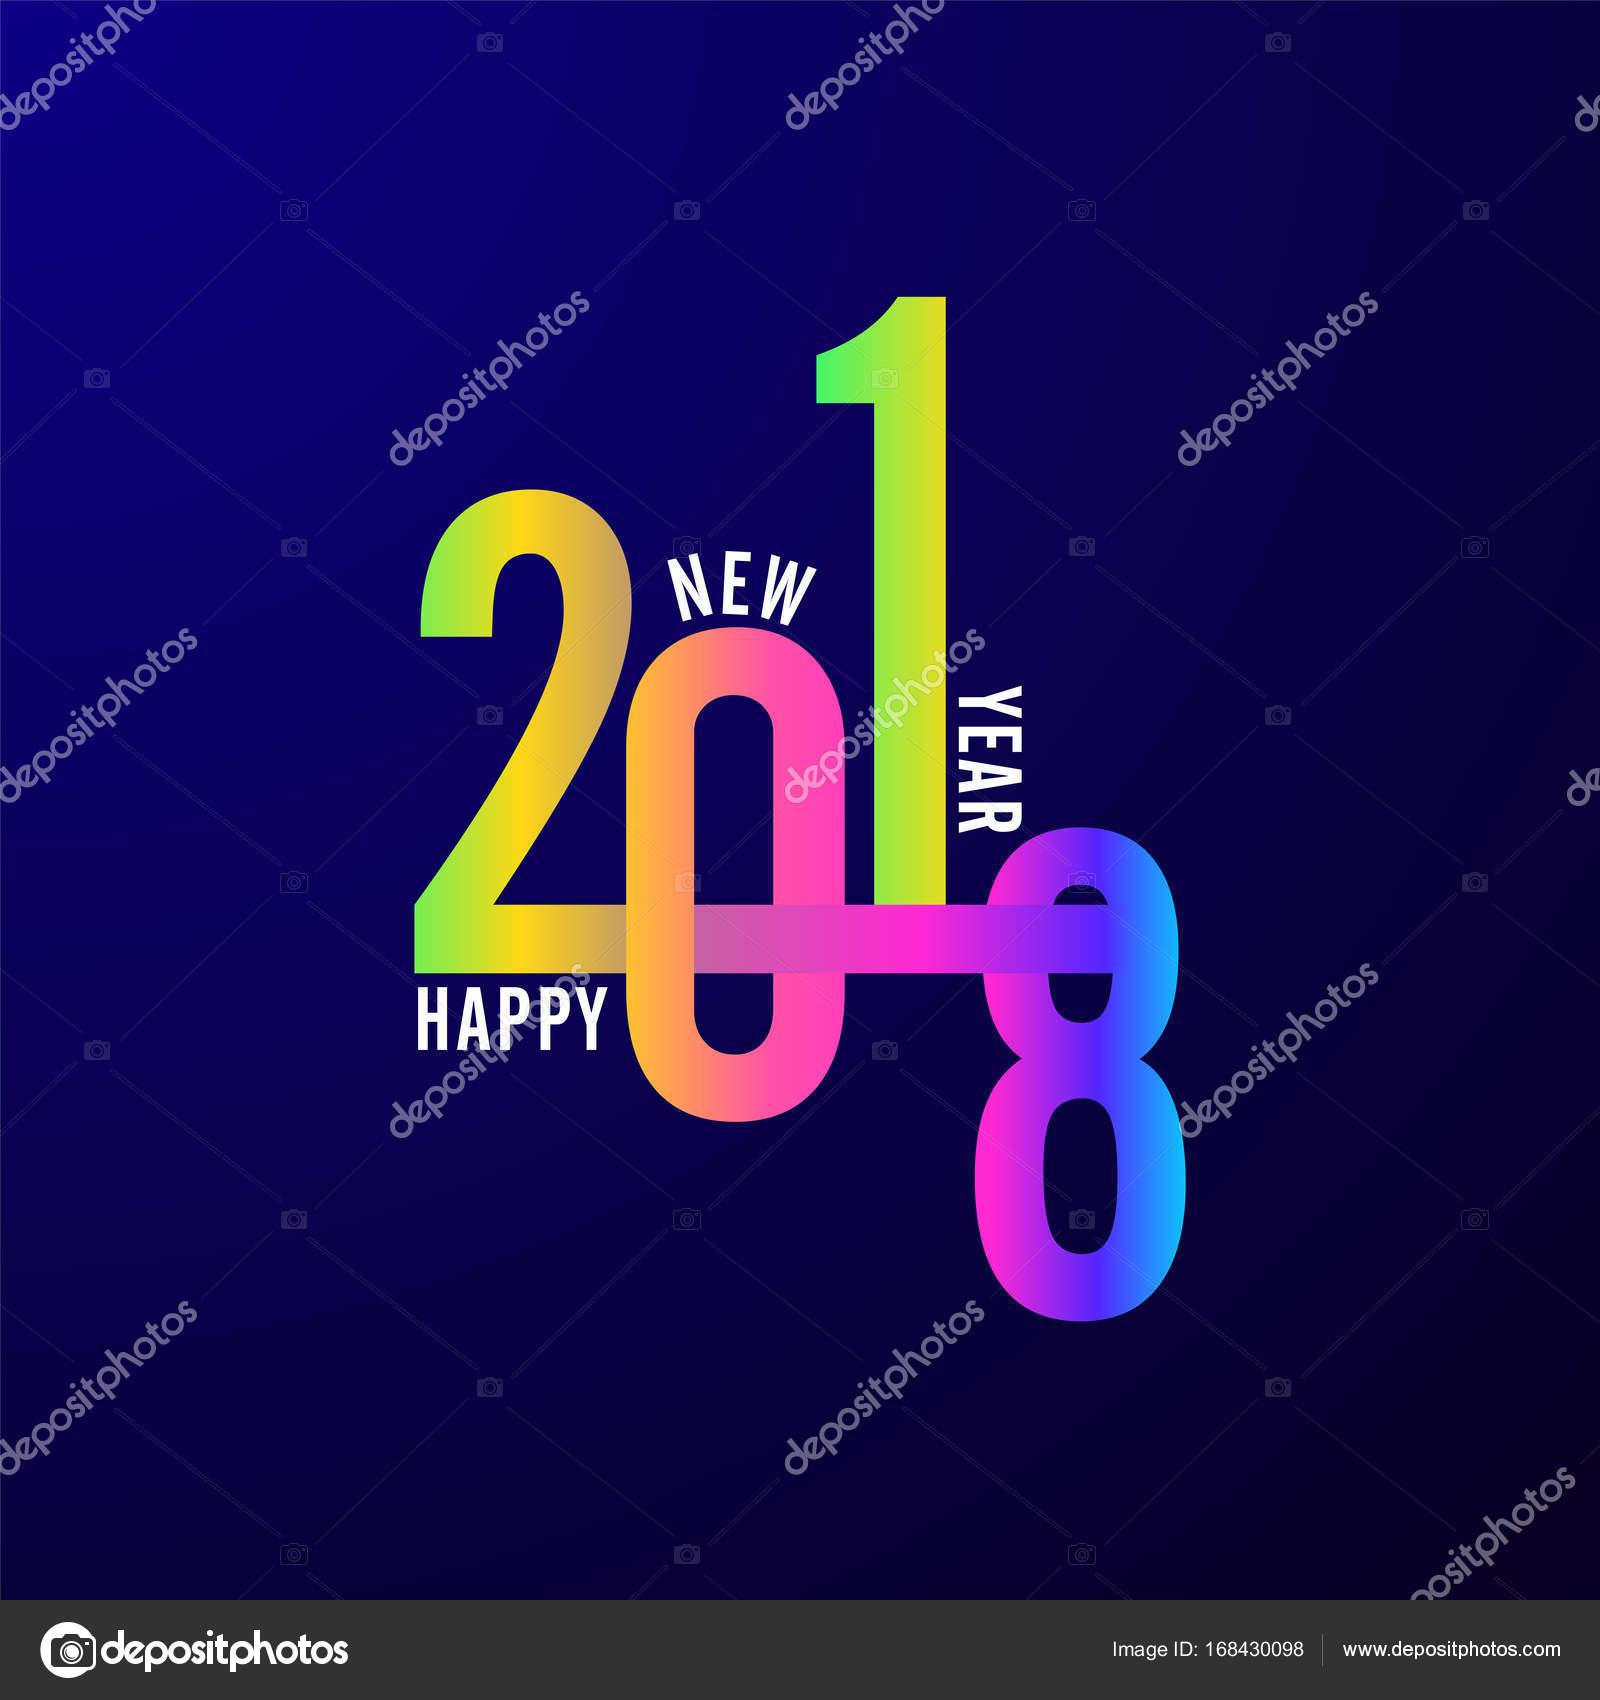 Look - Year new happy stylish photo video